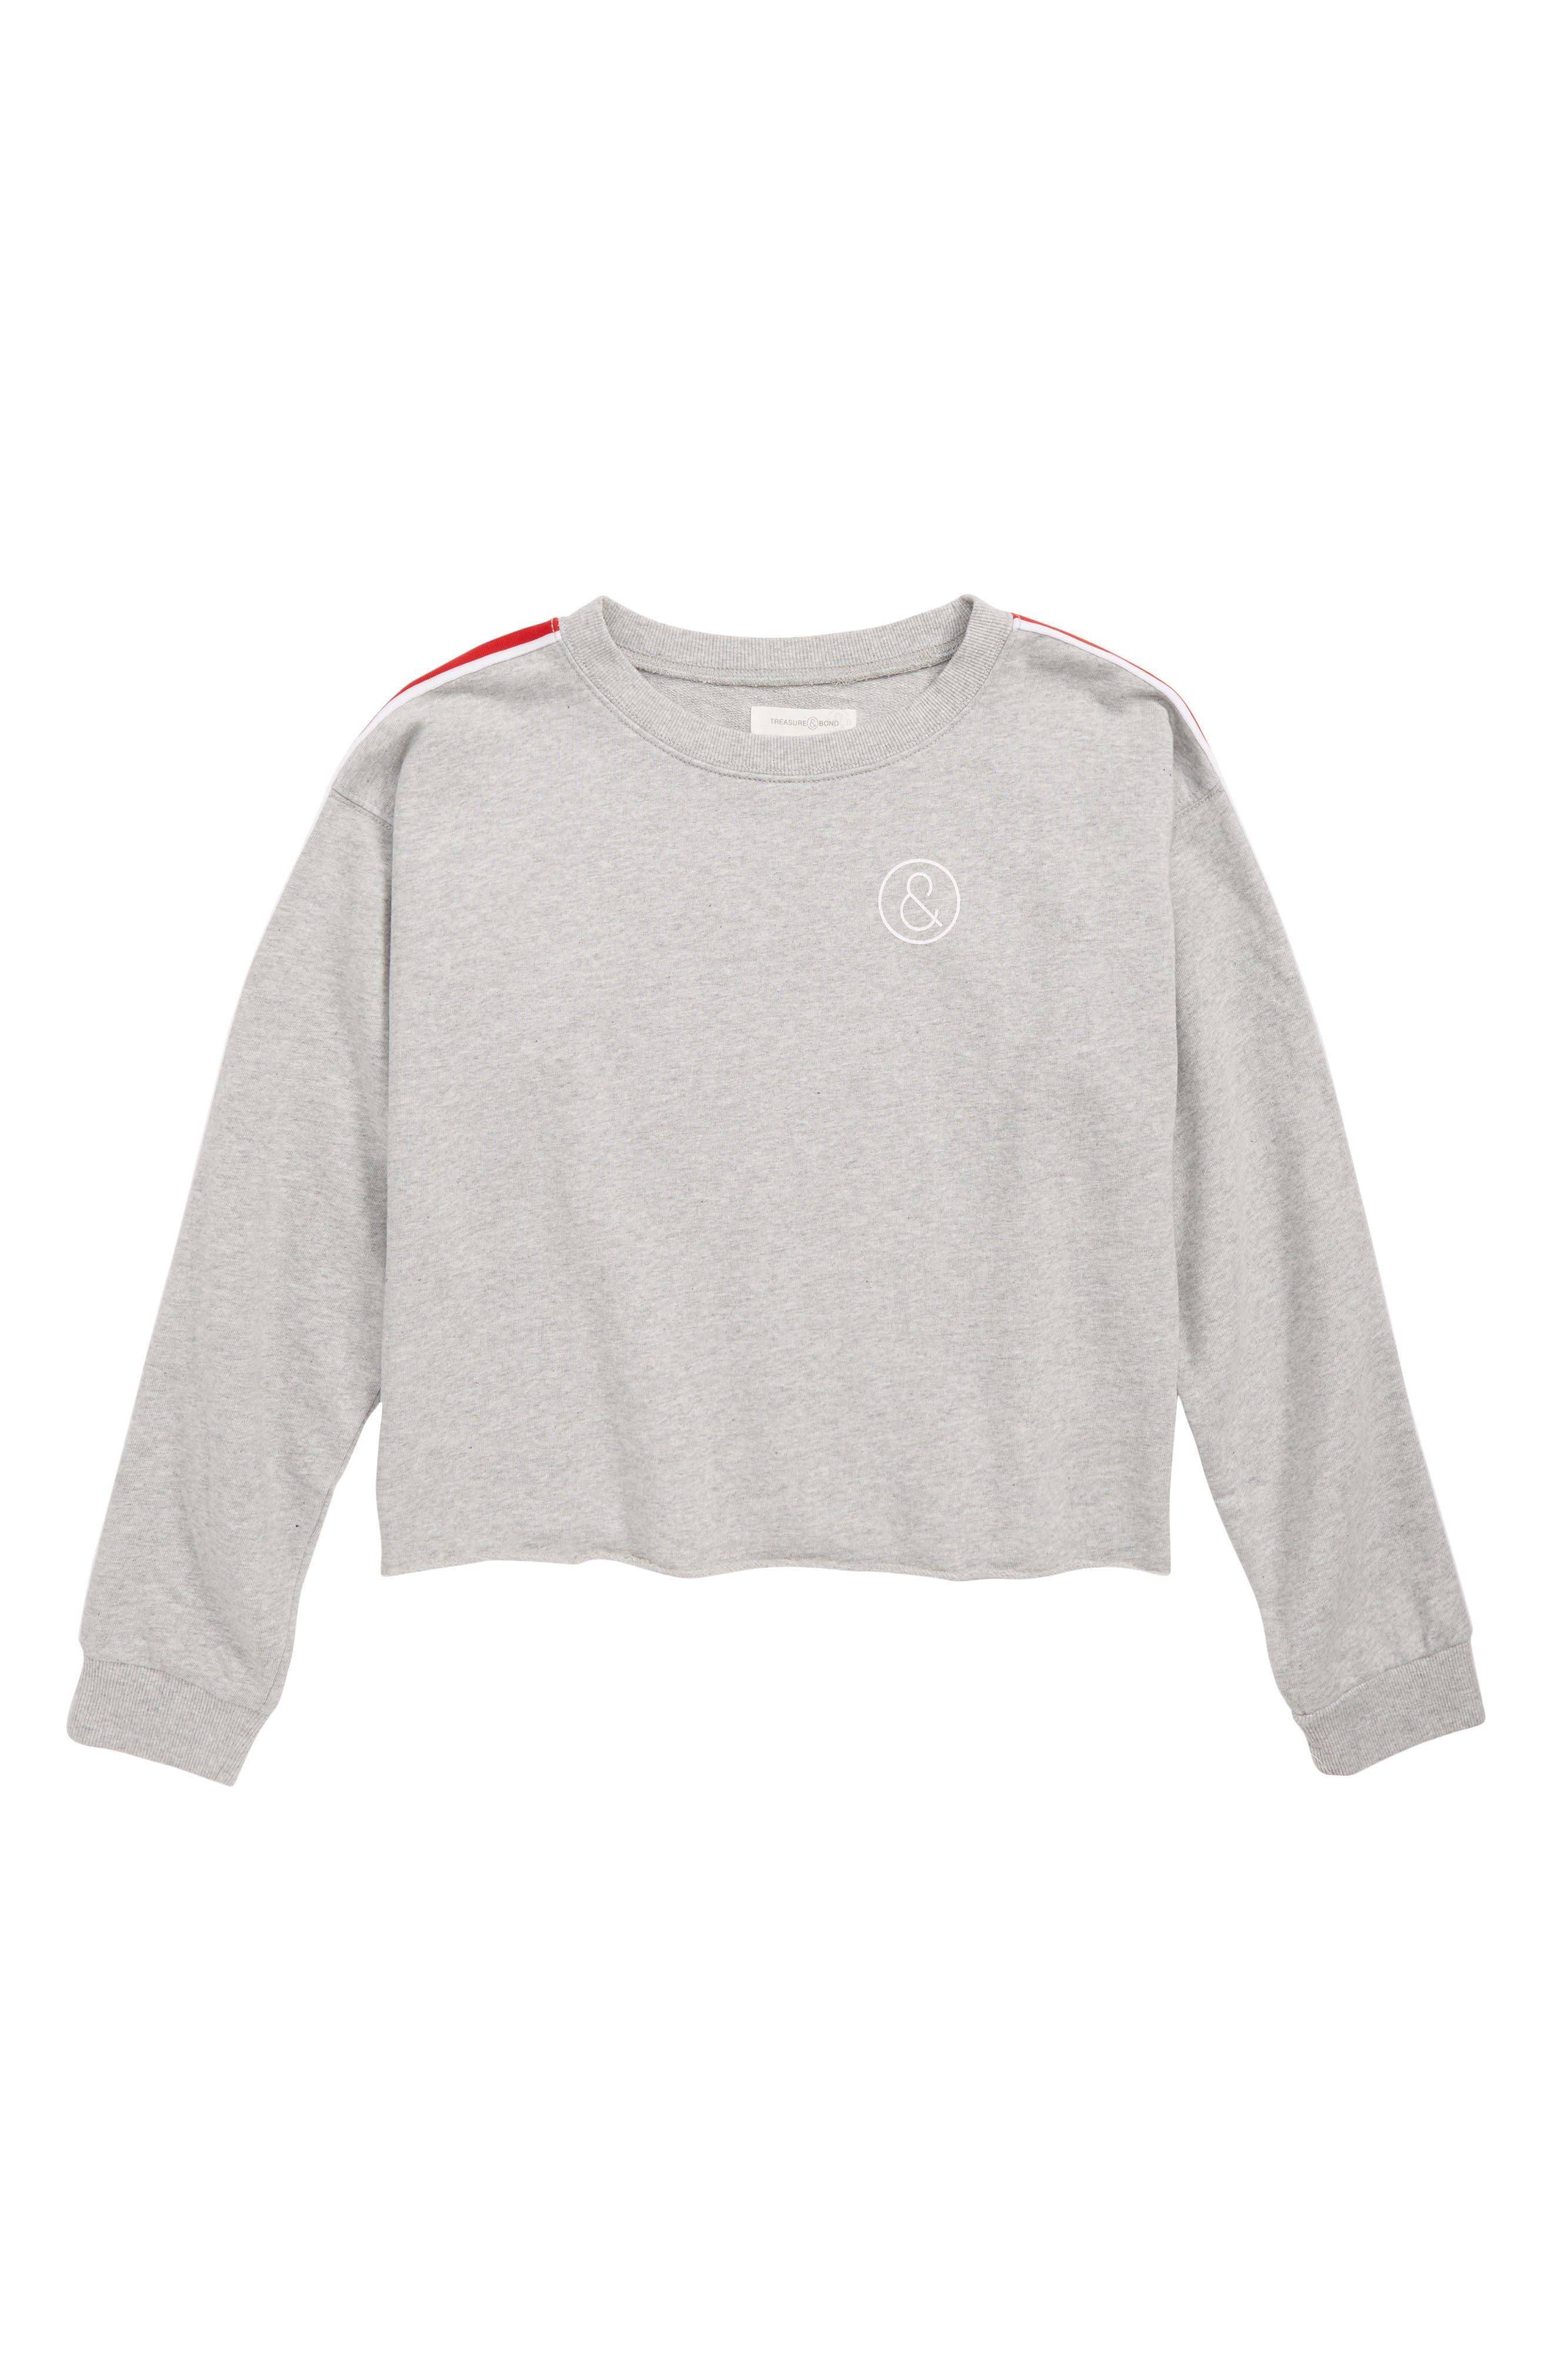 Varsity Fleece Sweatshirt,                             Main thumbnail 1, color,                             GREY ASH HEATHER